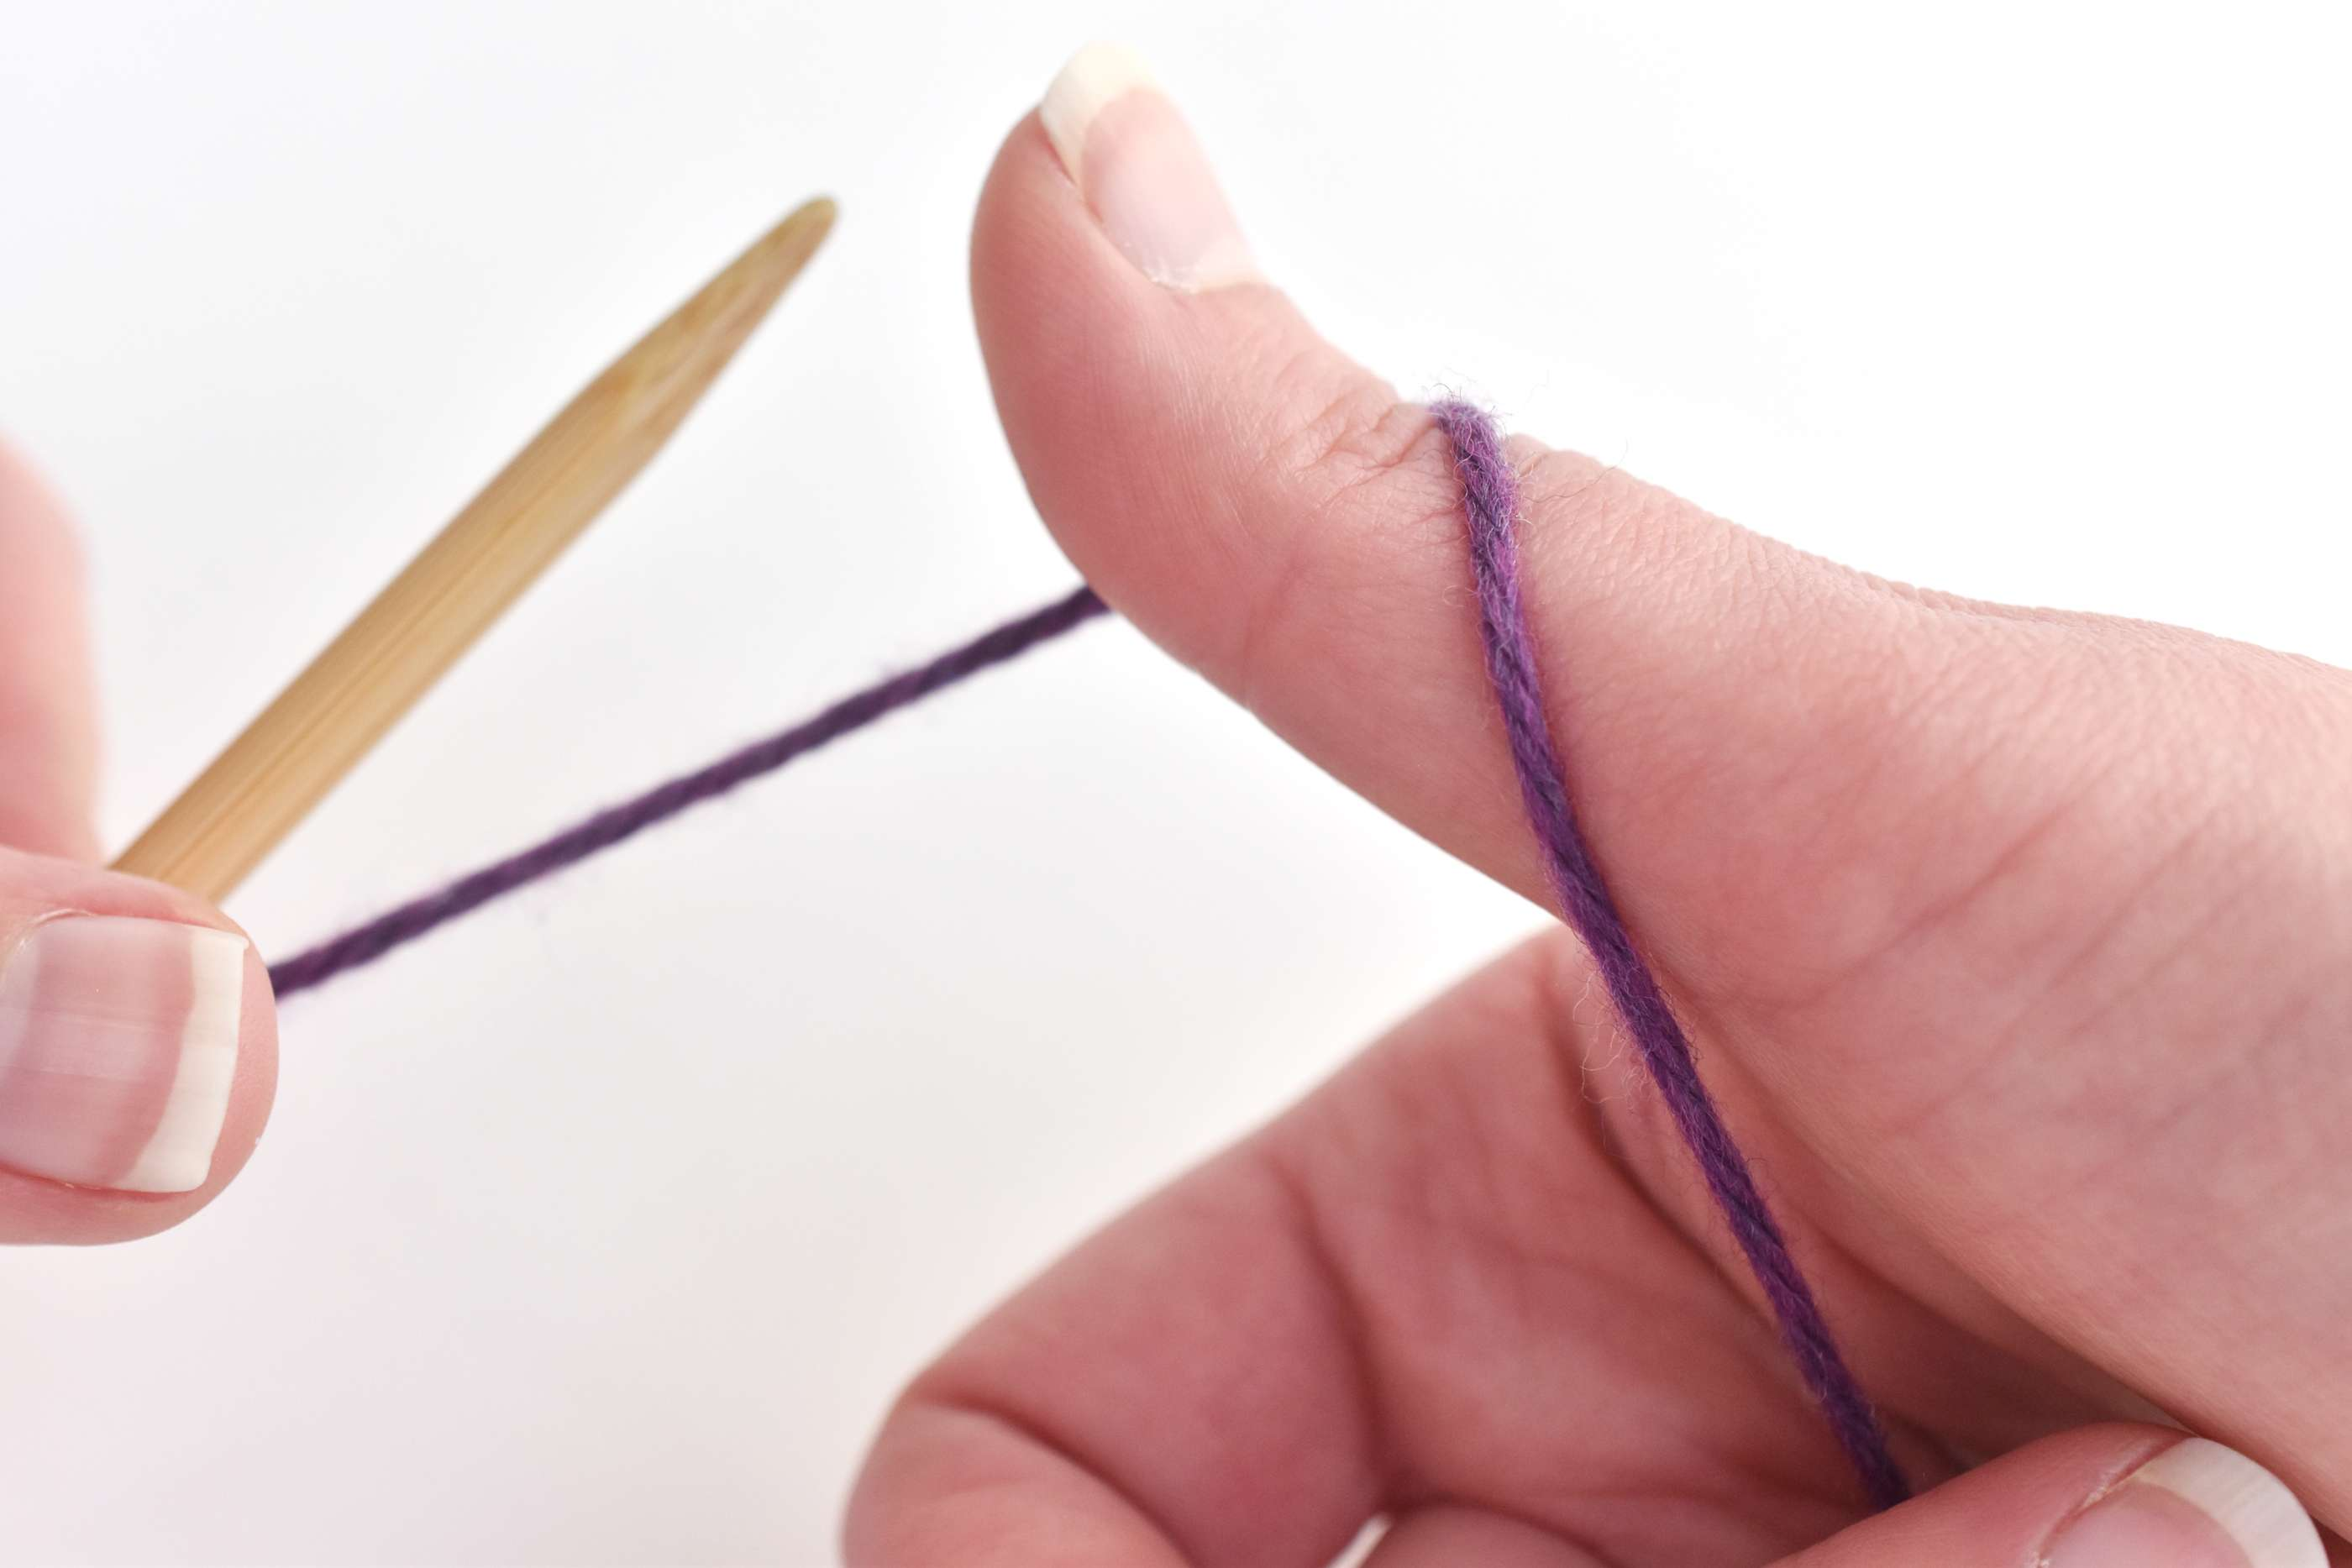 Wrap the Yarn Around Your Thumb